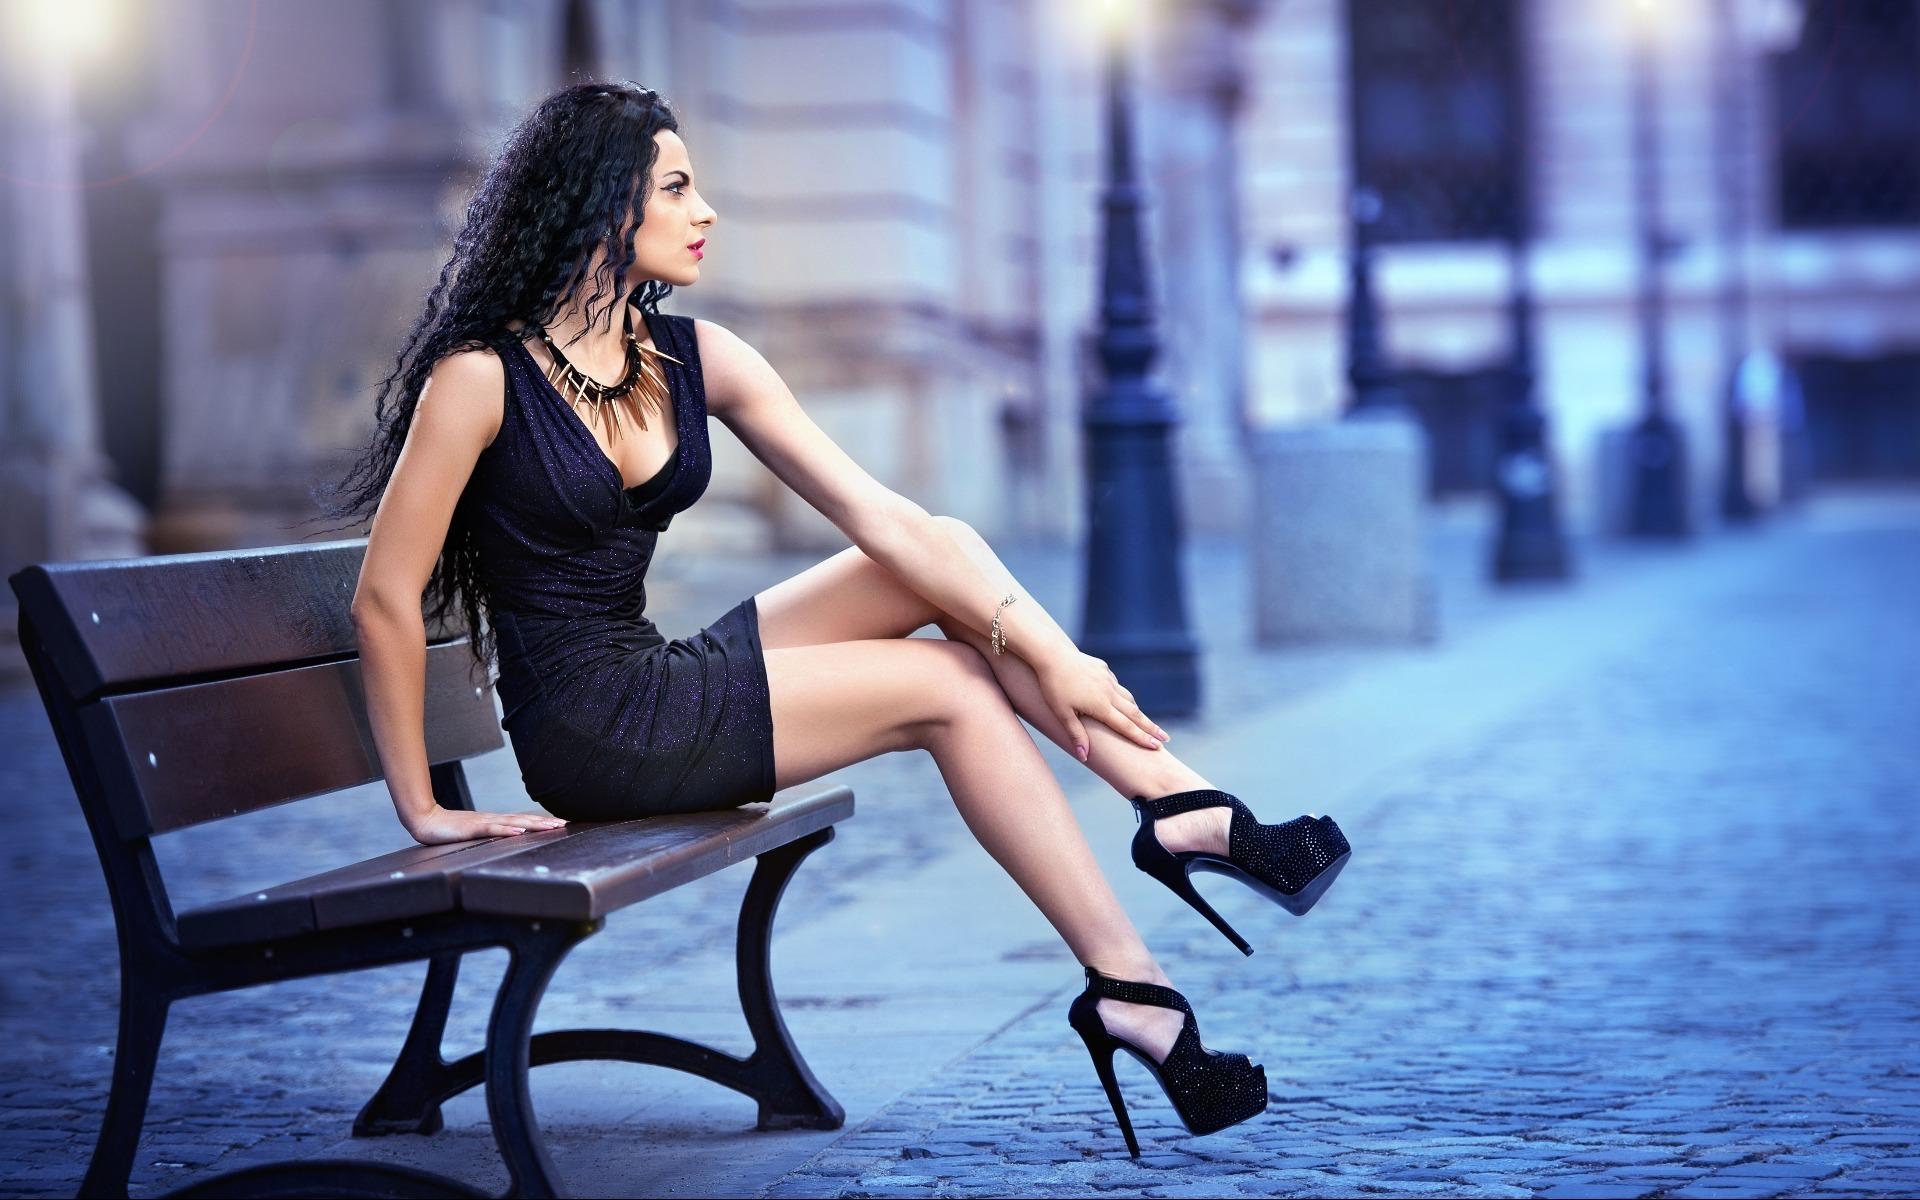 long-hardcore-girl-with-hot-legs